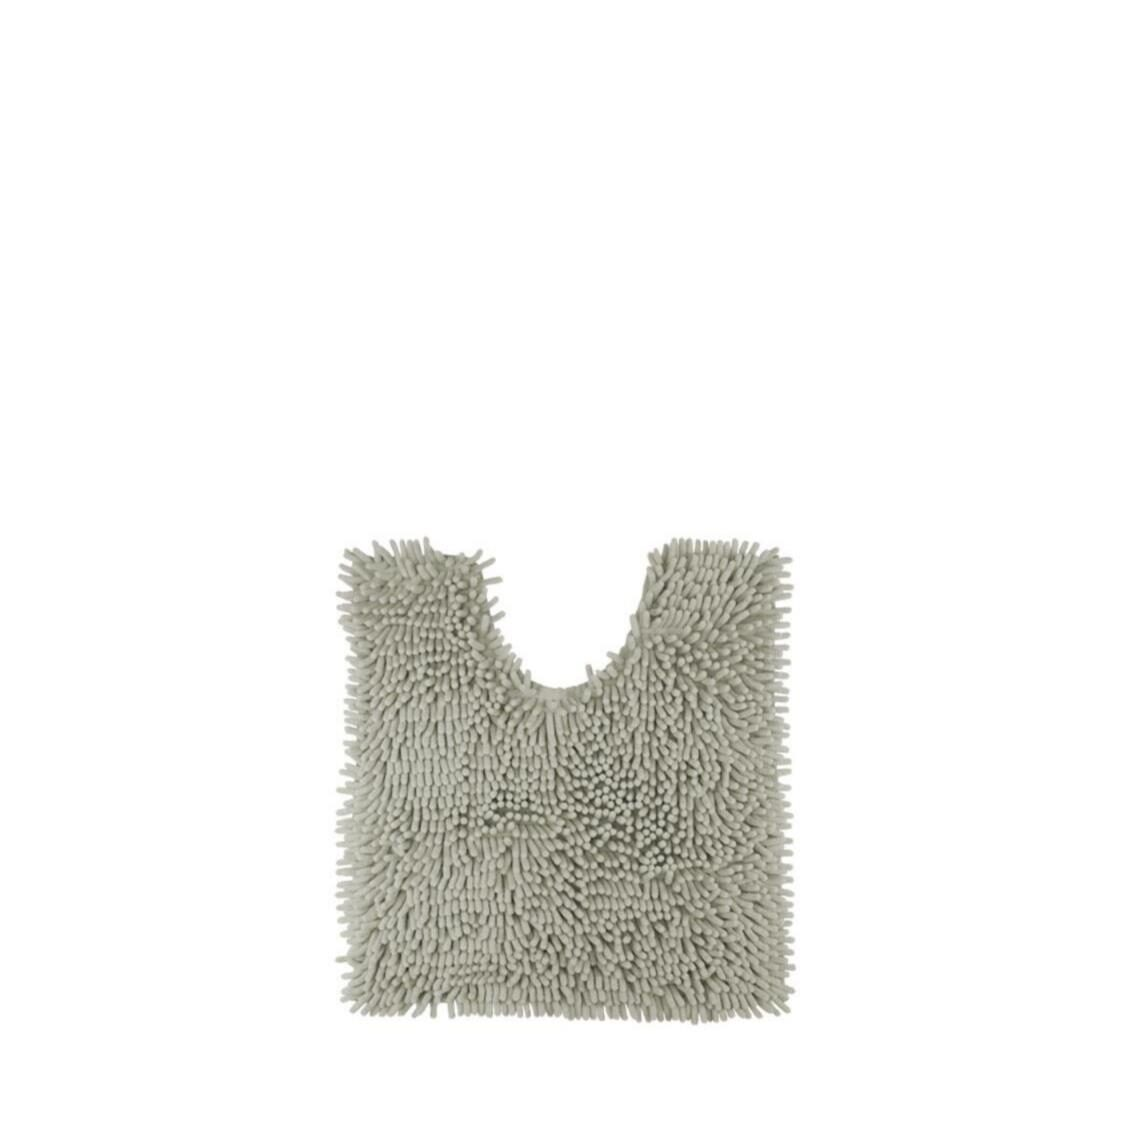 Charles Millen 100 Microfibre Mat with styrene-butadiene Antislip Backing Moppy CONTOUR MFM-5 Stone